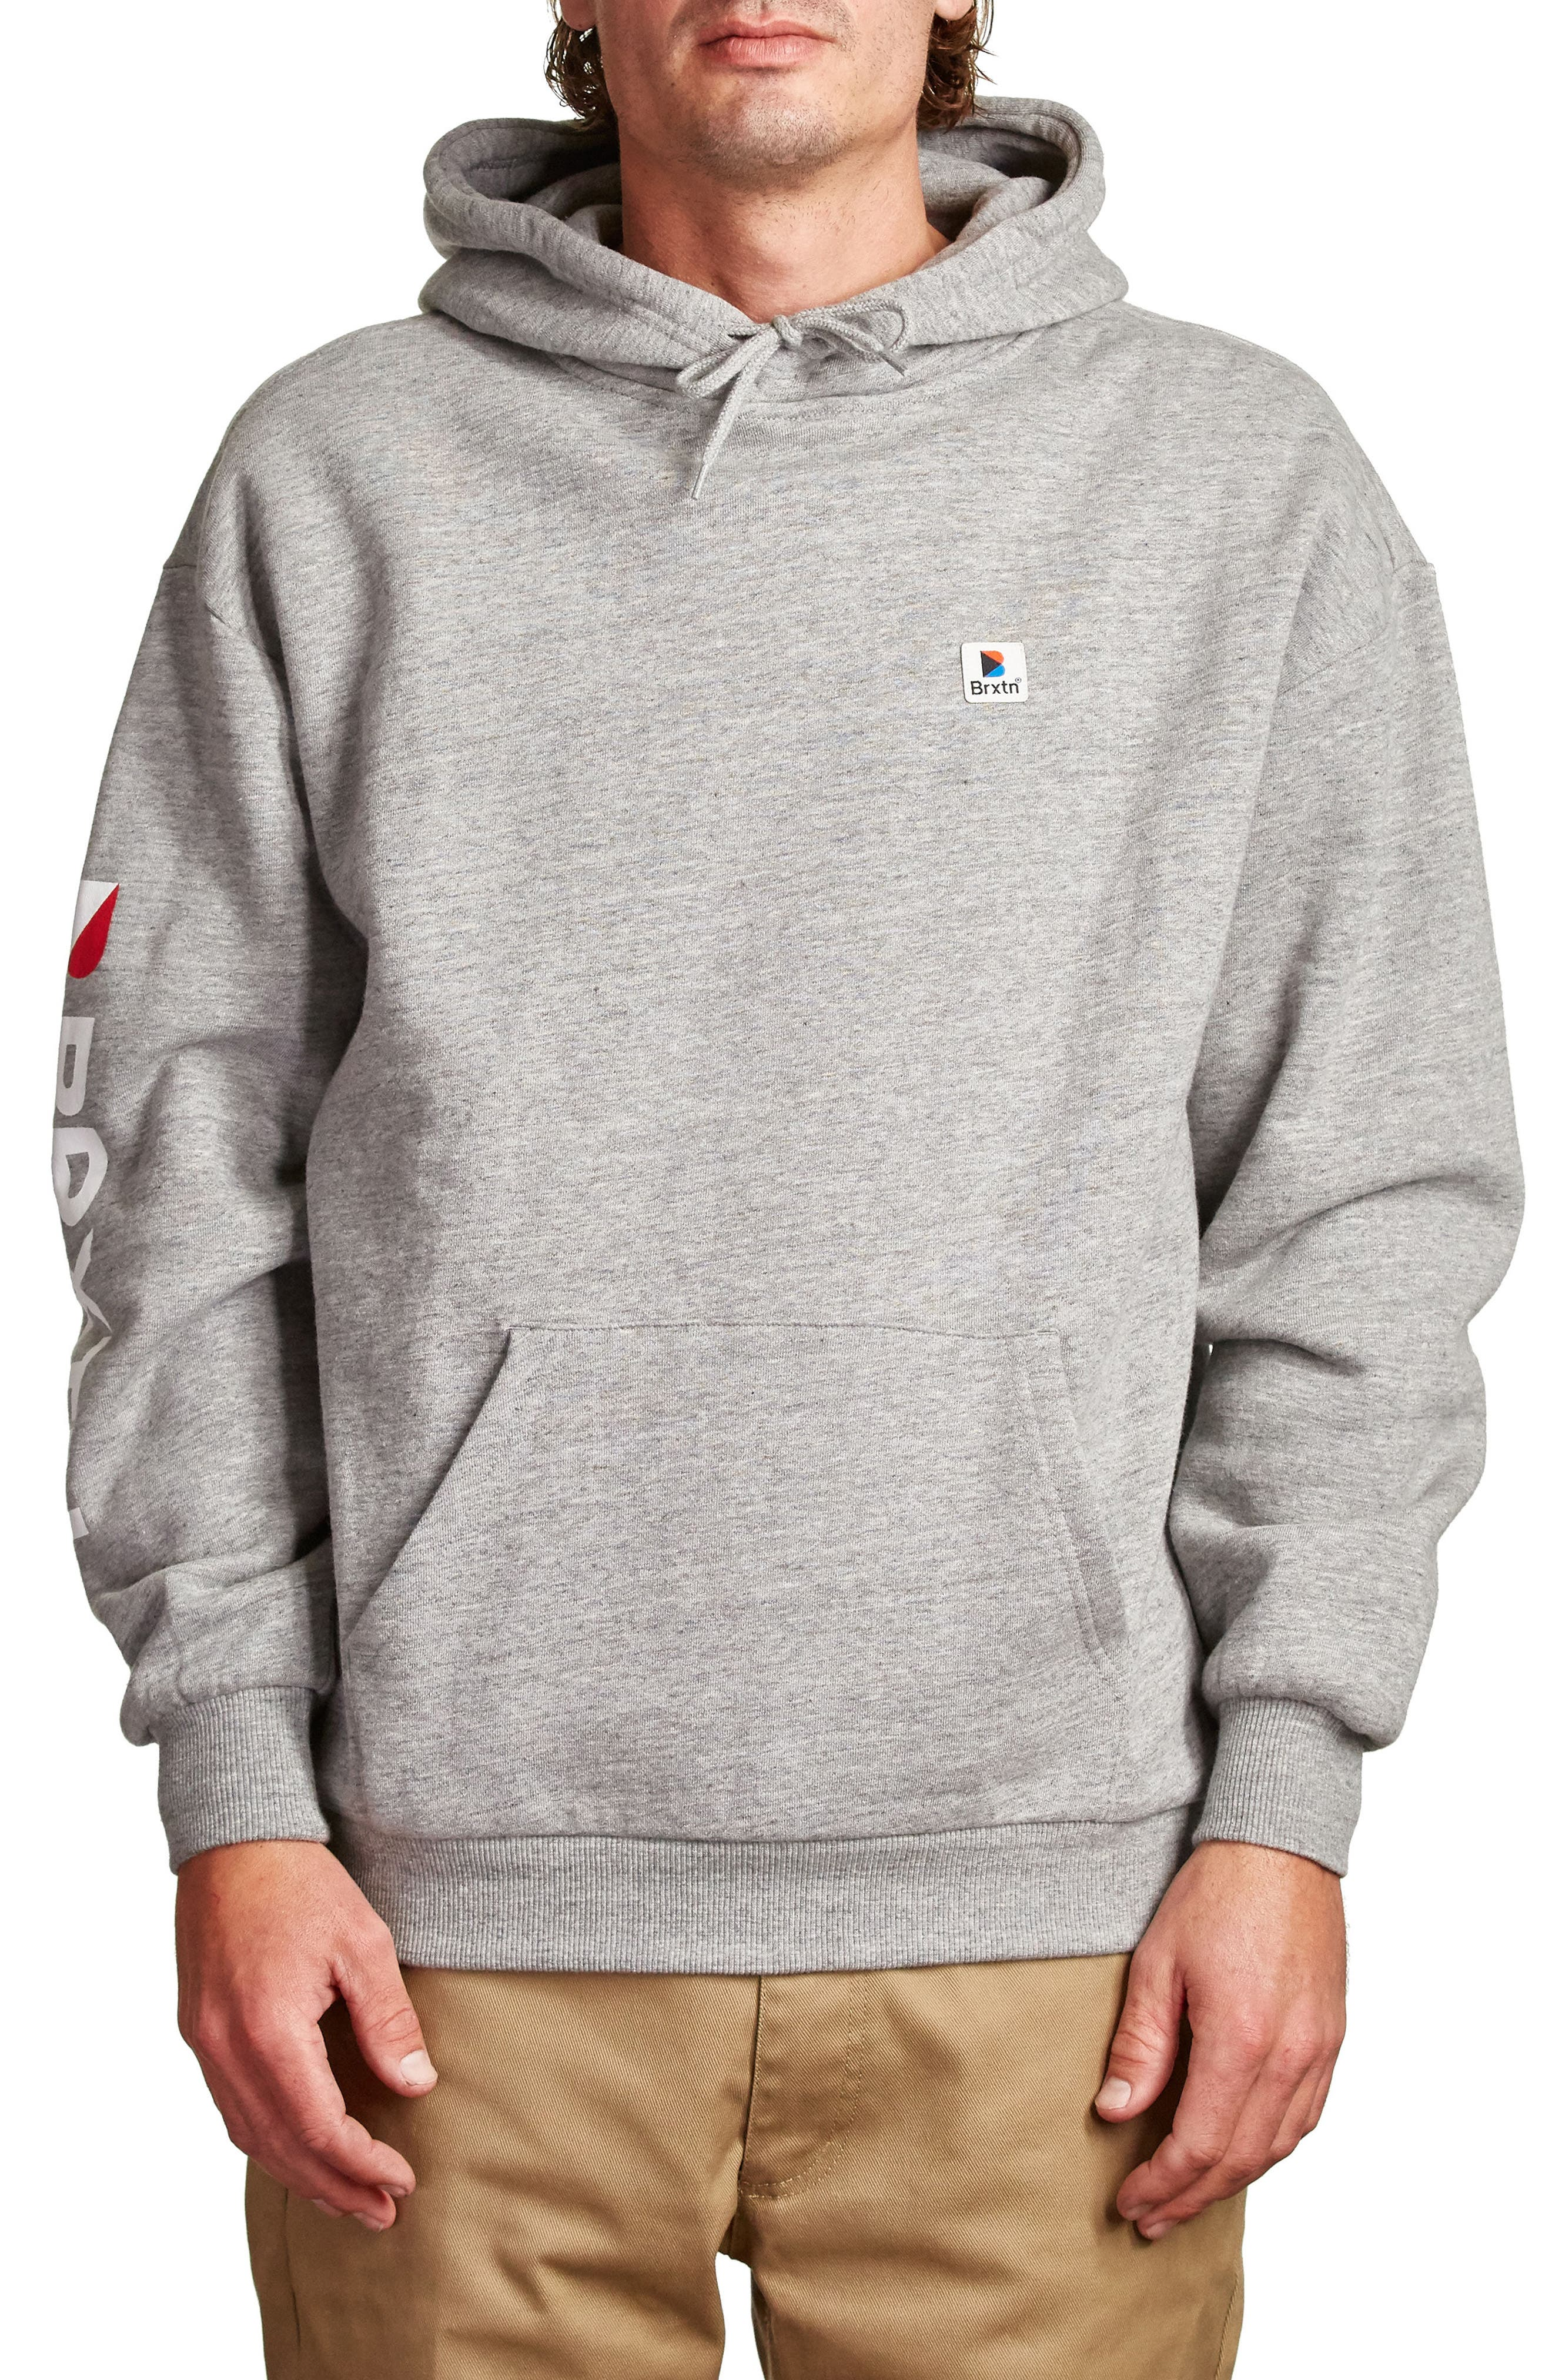 Stowell Hoodie Sweatshirt,                             Main thumbnail 1, color,